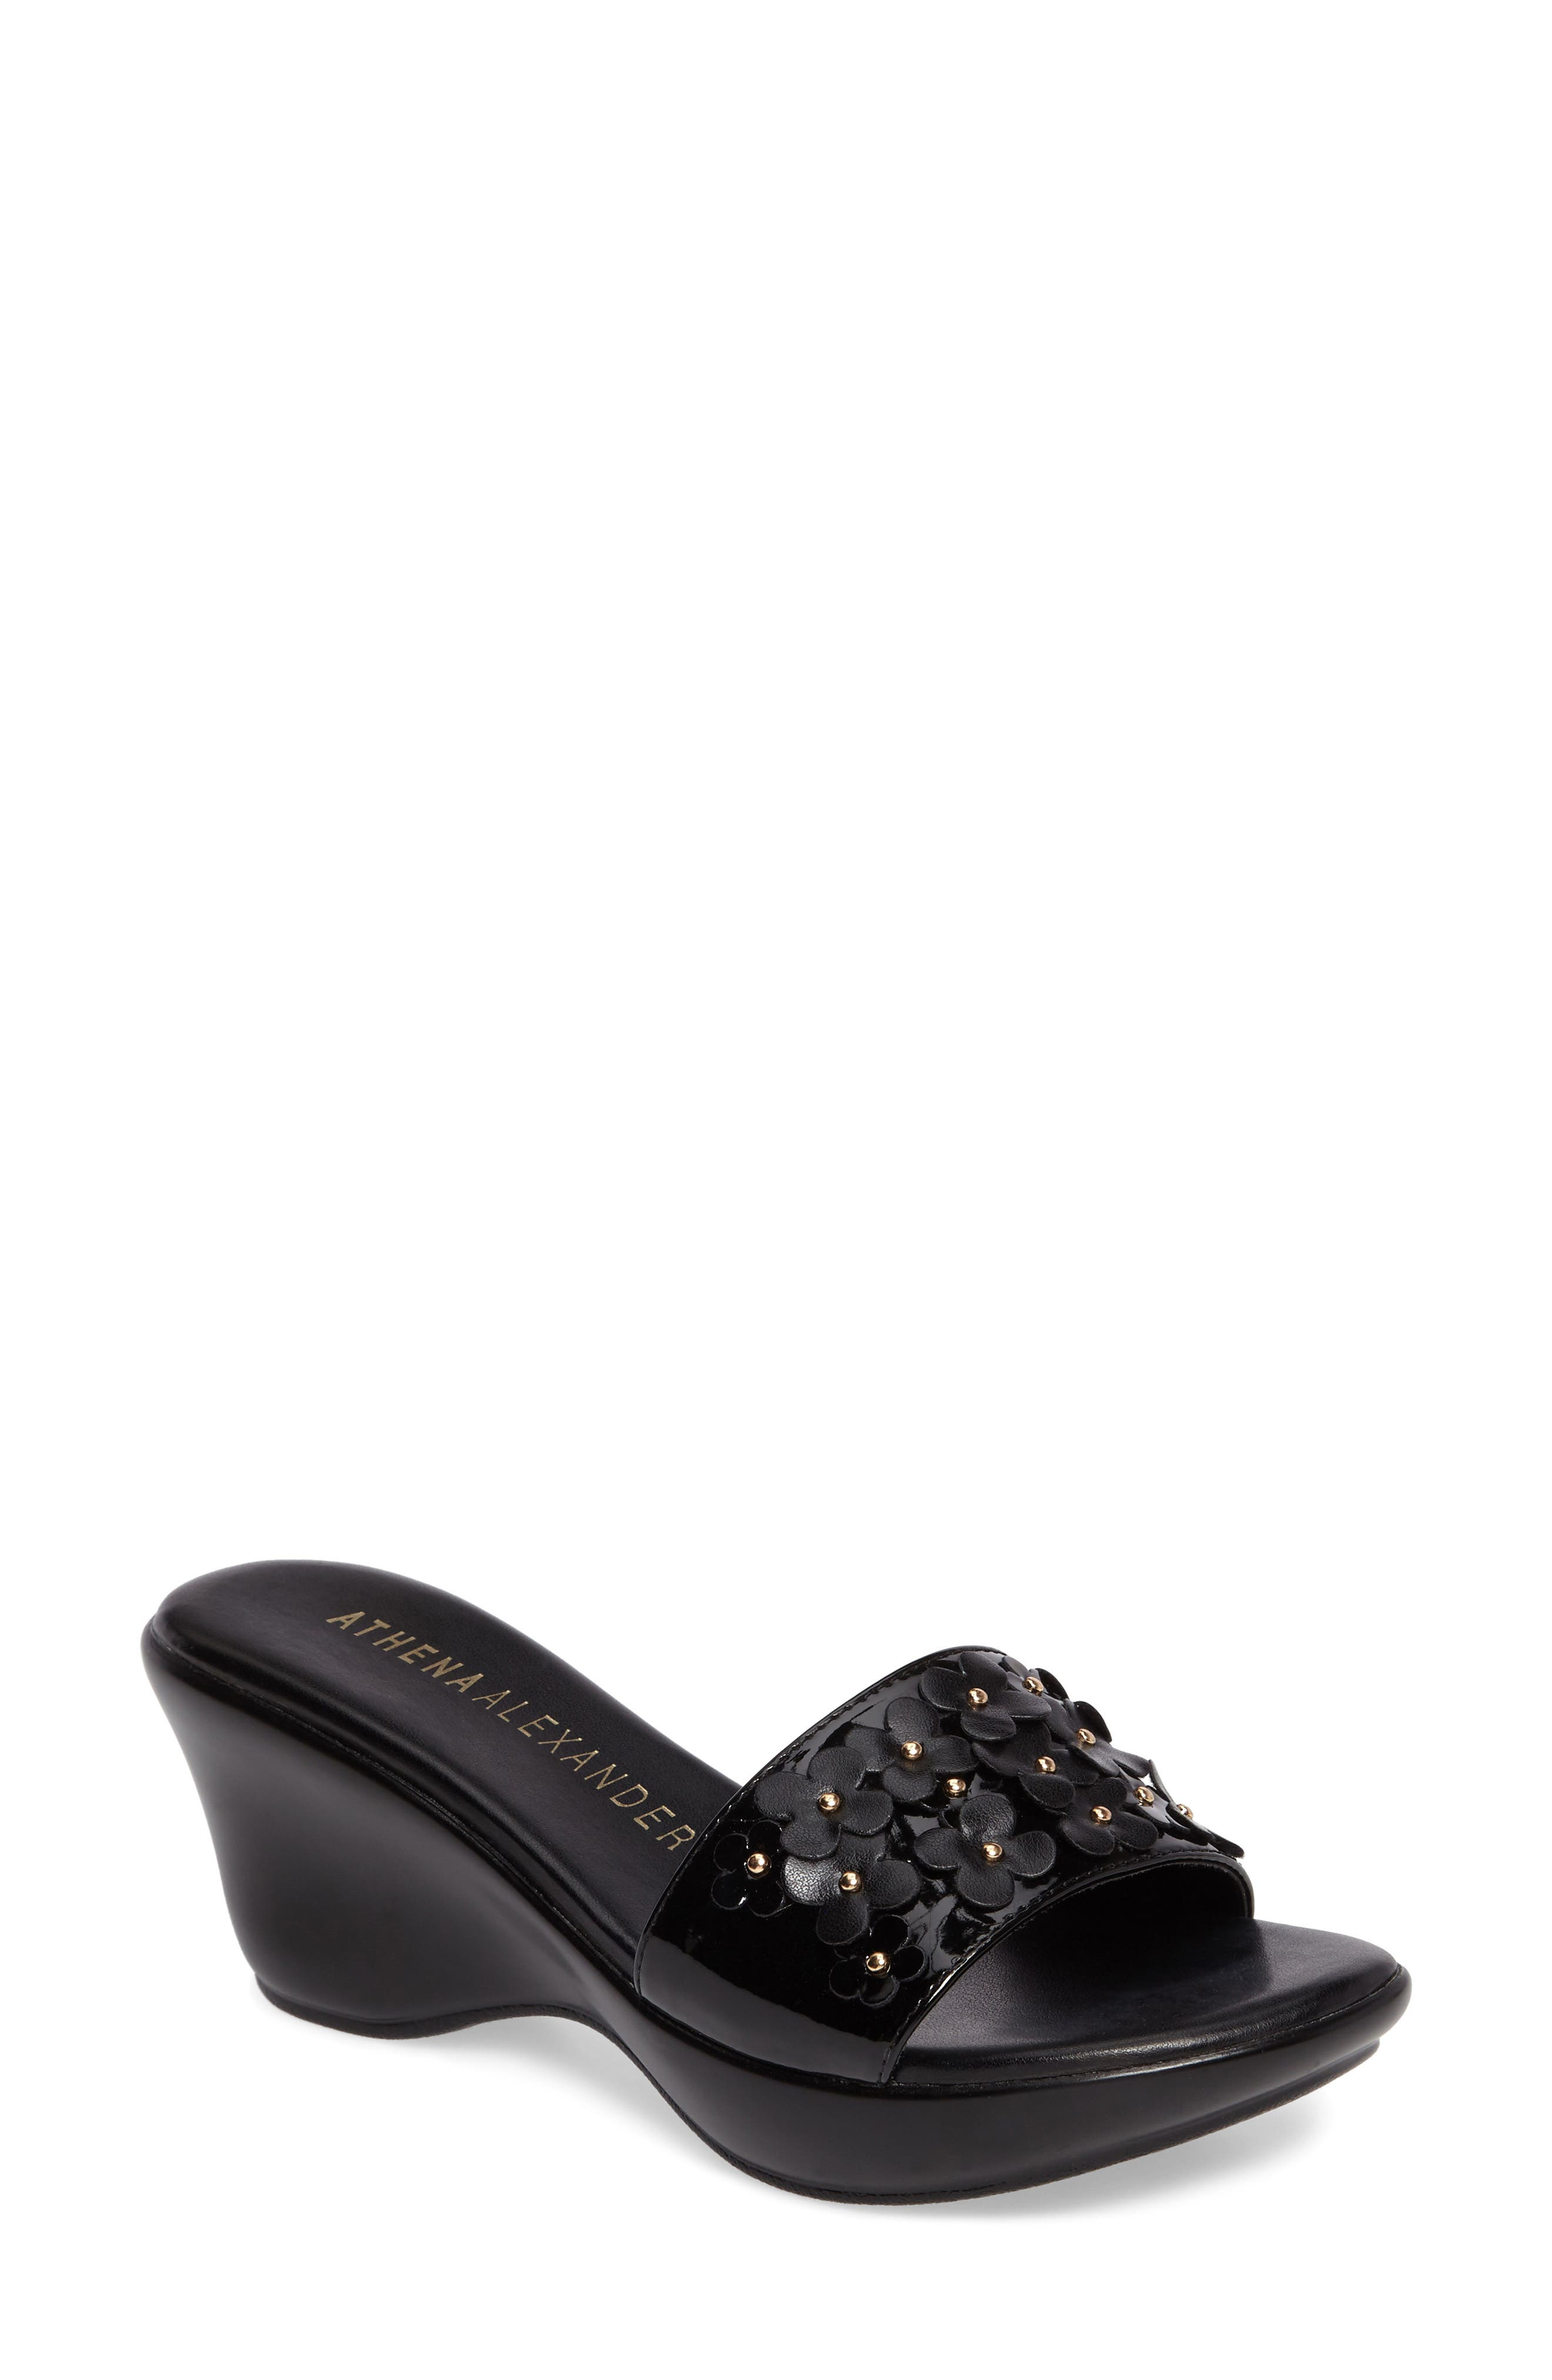 Allegra Wedge Slide,                             Main thumbnail 1, color,                             Black Faux Leather